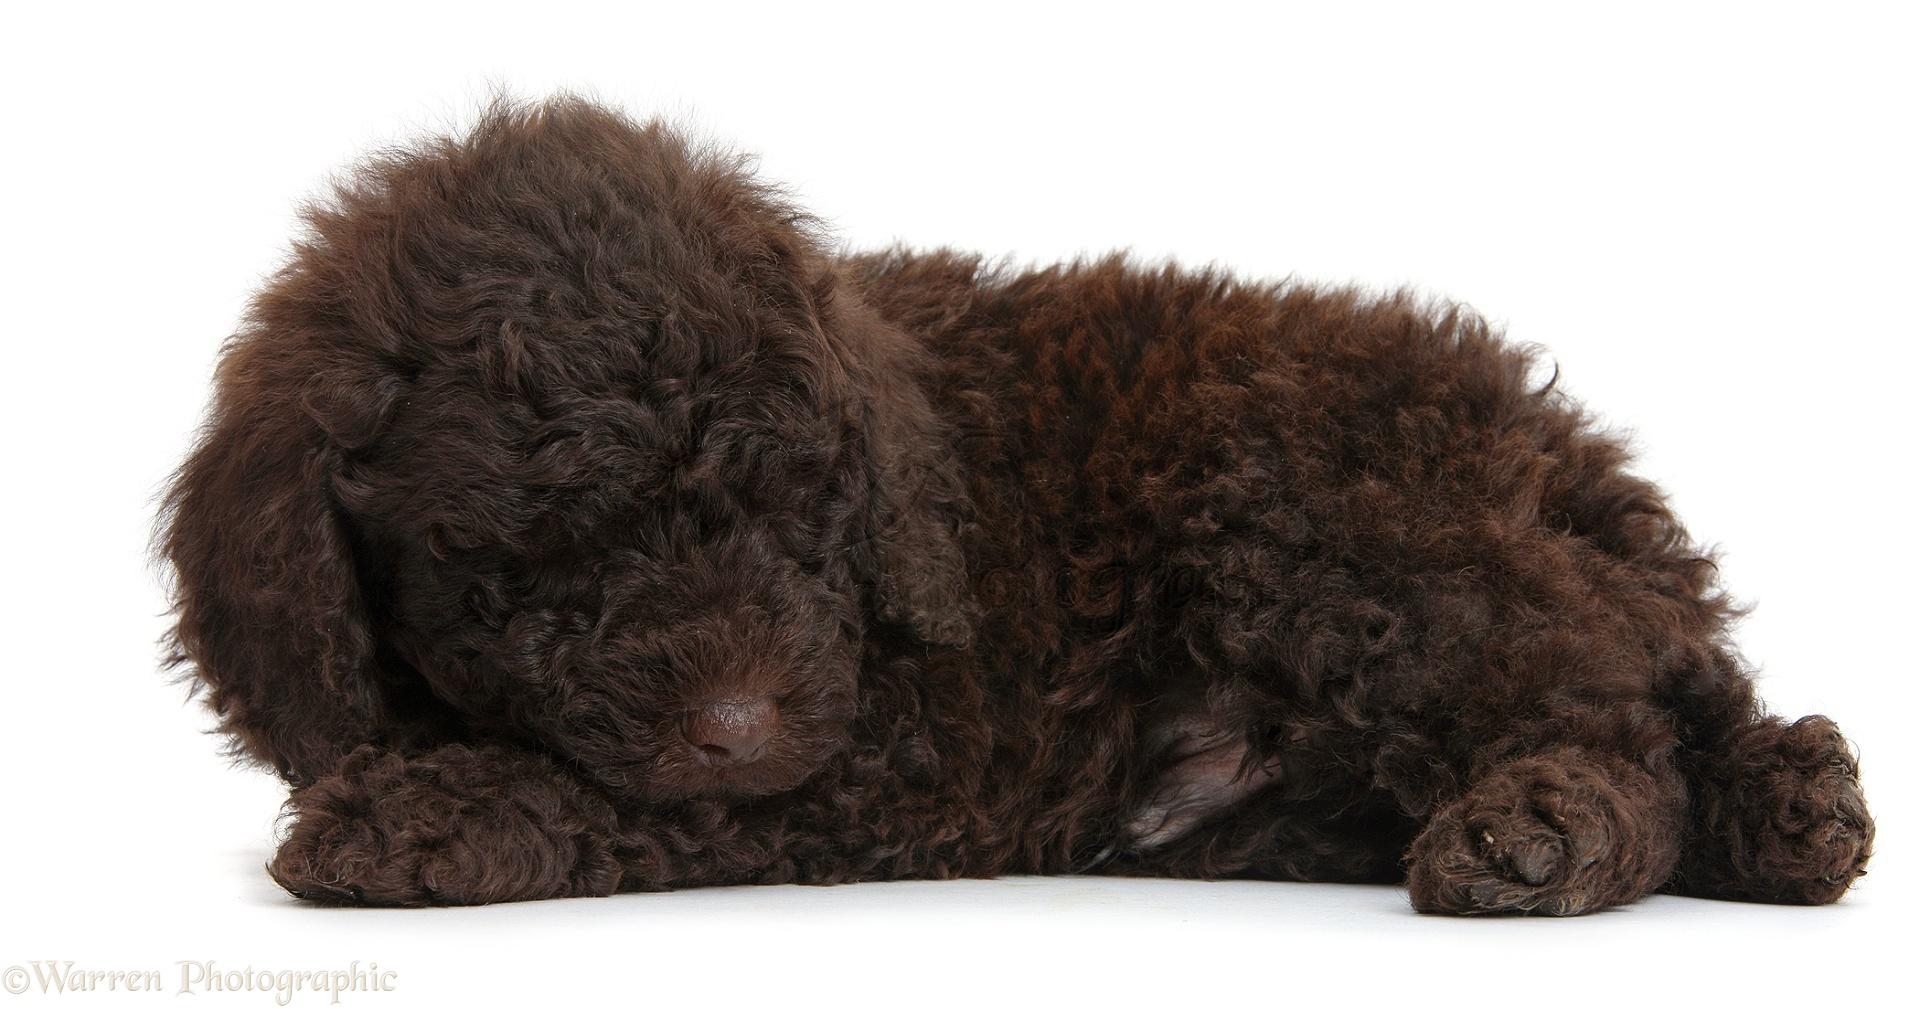 Dog Cute Sleeping Chocolate Toy Goldendoodle Puppy Photo Wp37783